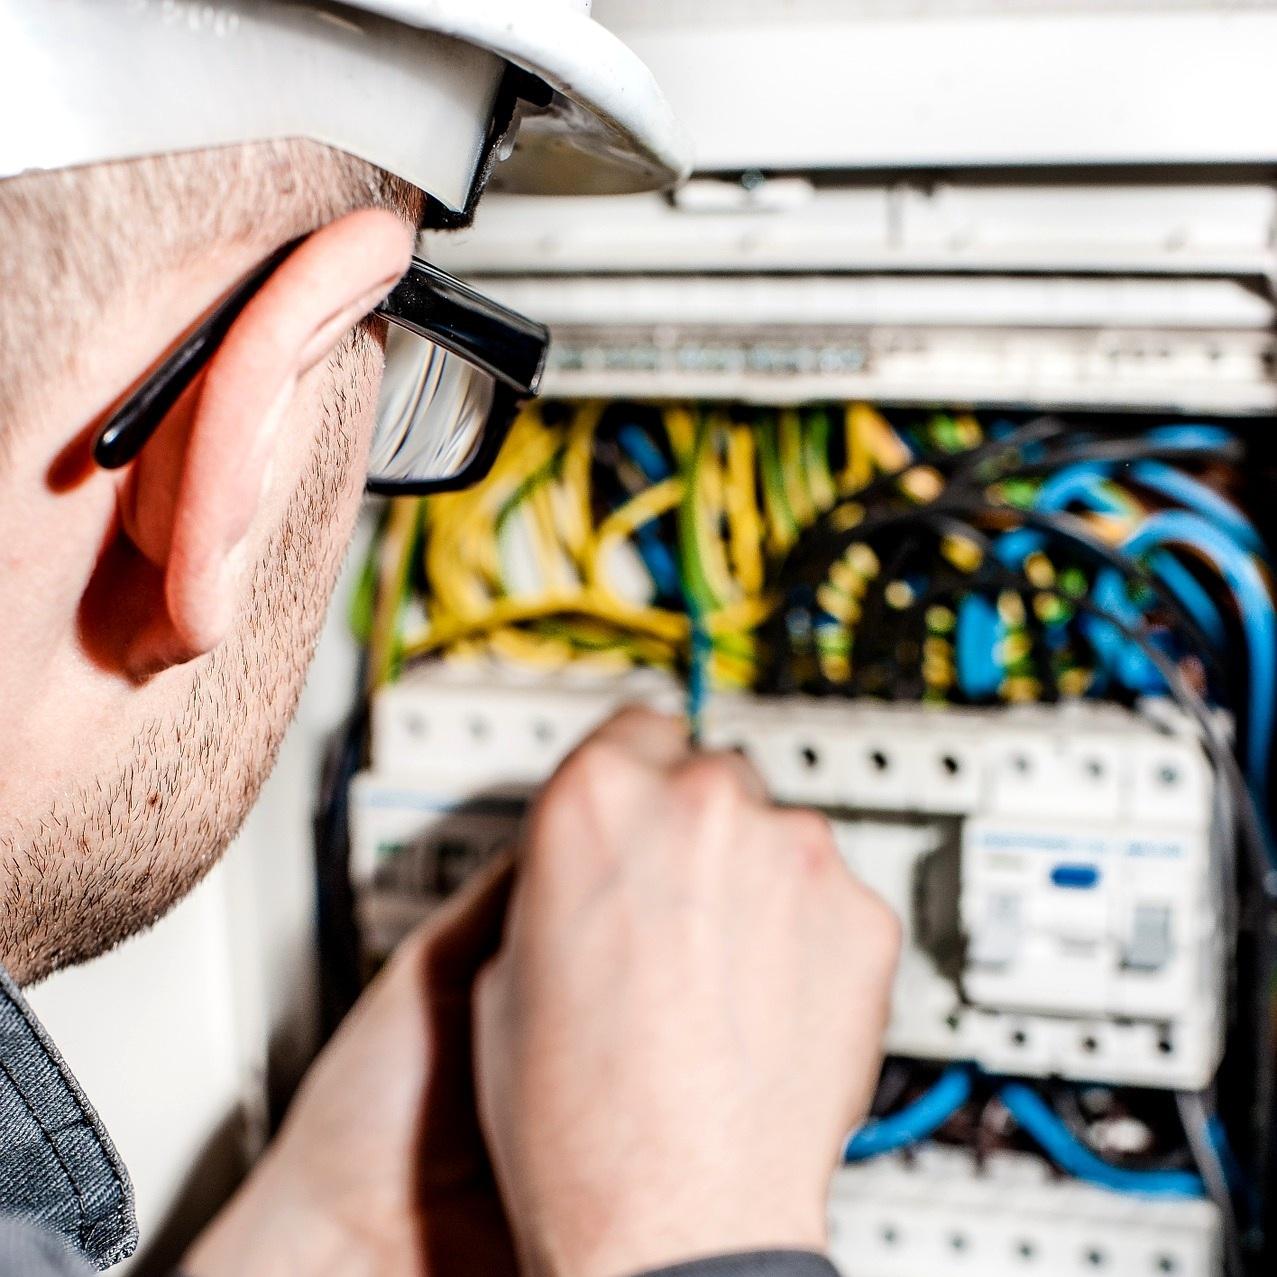 electrician-1080574_1920.jpg